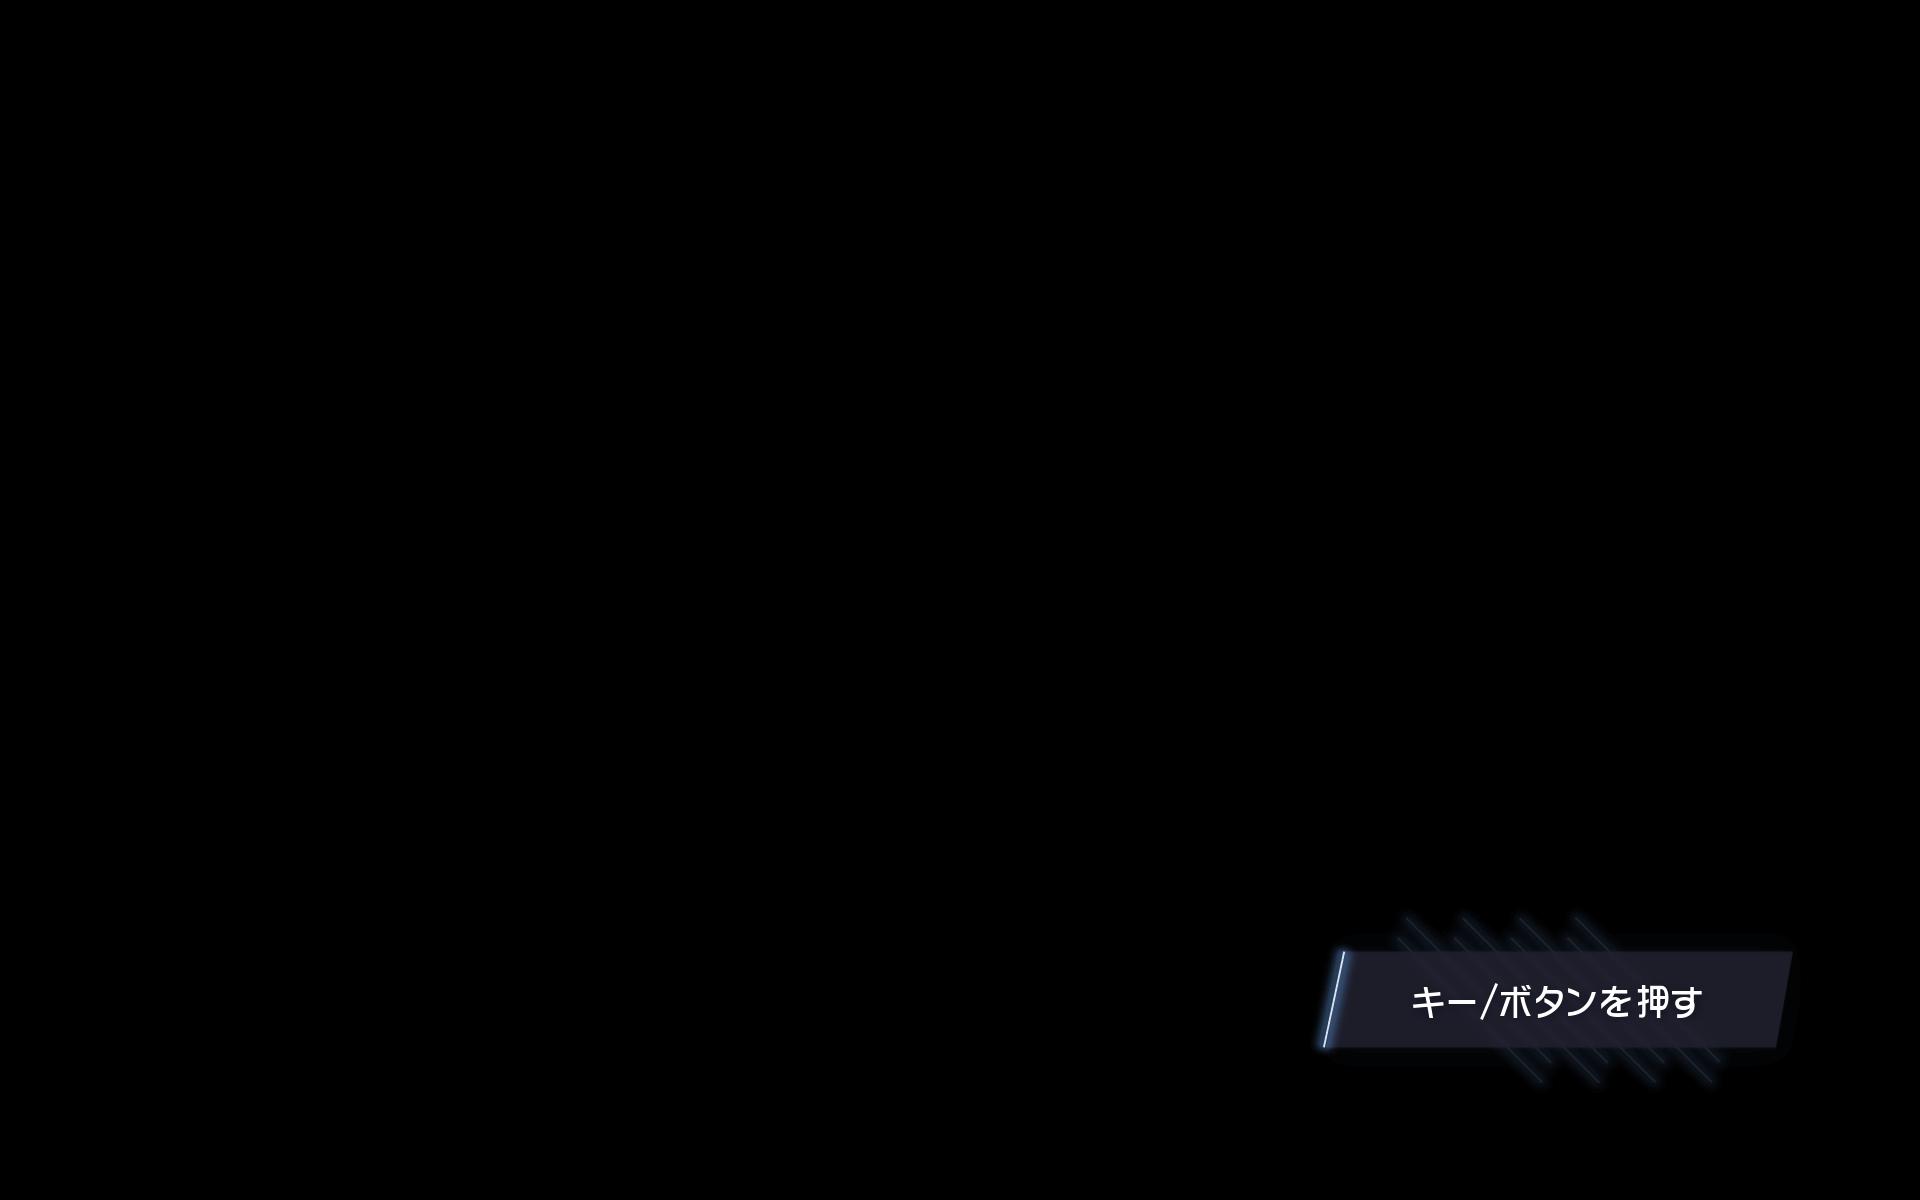 PC ゲーム Prey (2017年版) ゲームプレイ最適化メモ、ロード後はなにかキー/ボタンを押さないとゲームが進まない仕様